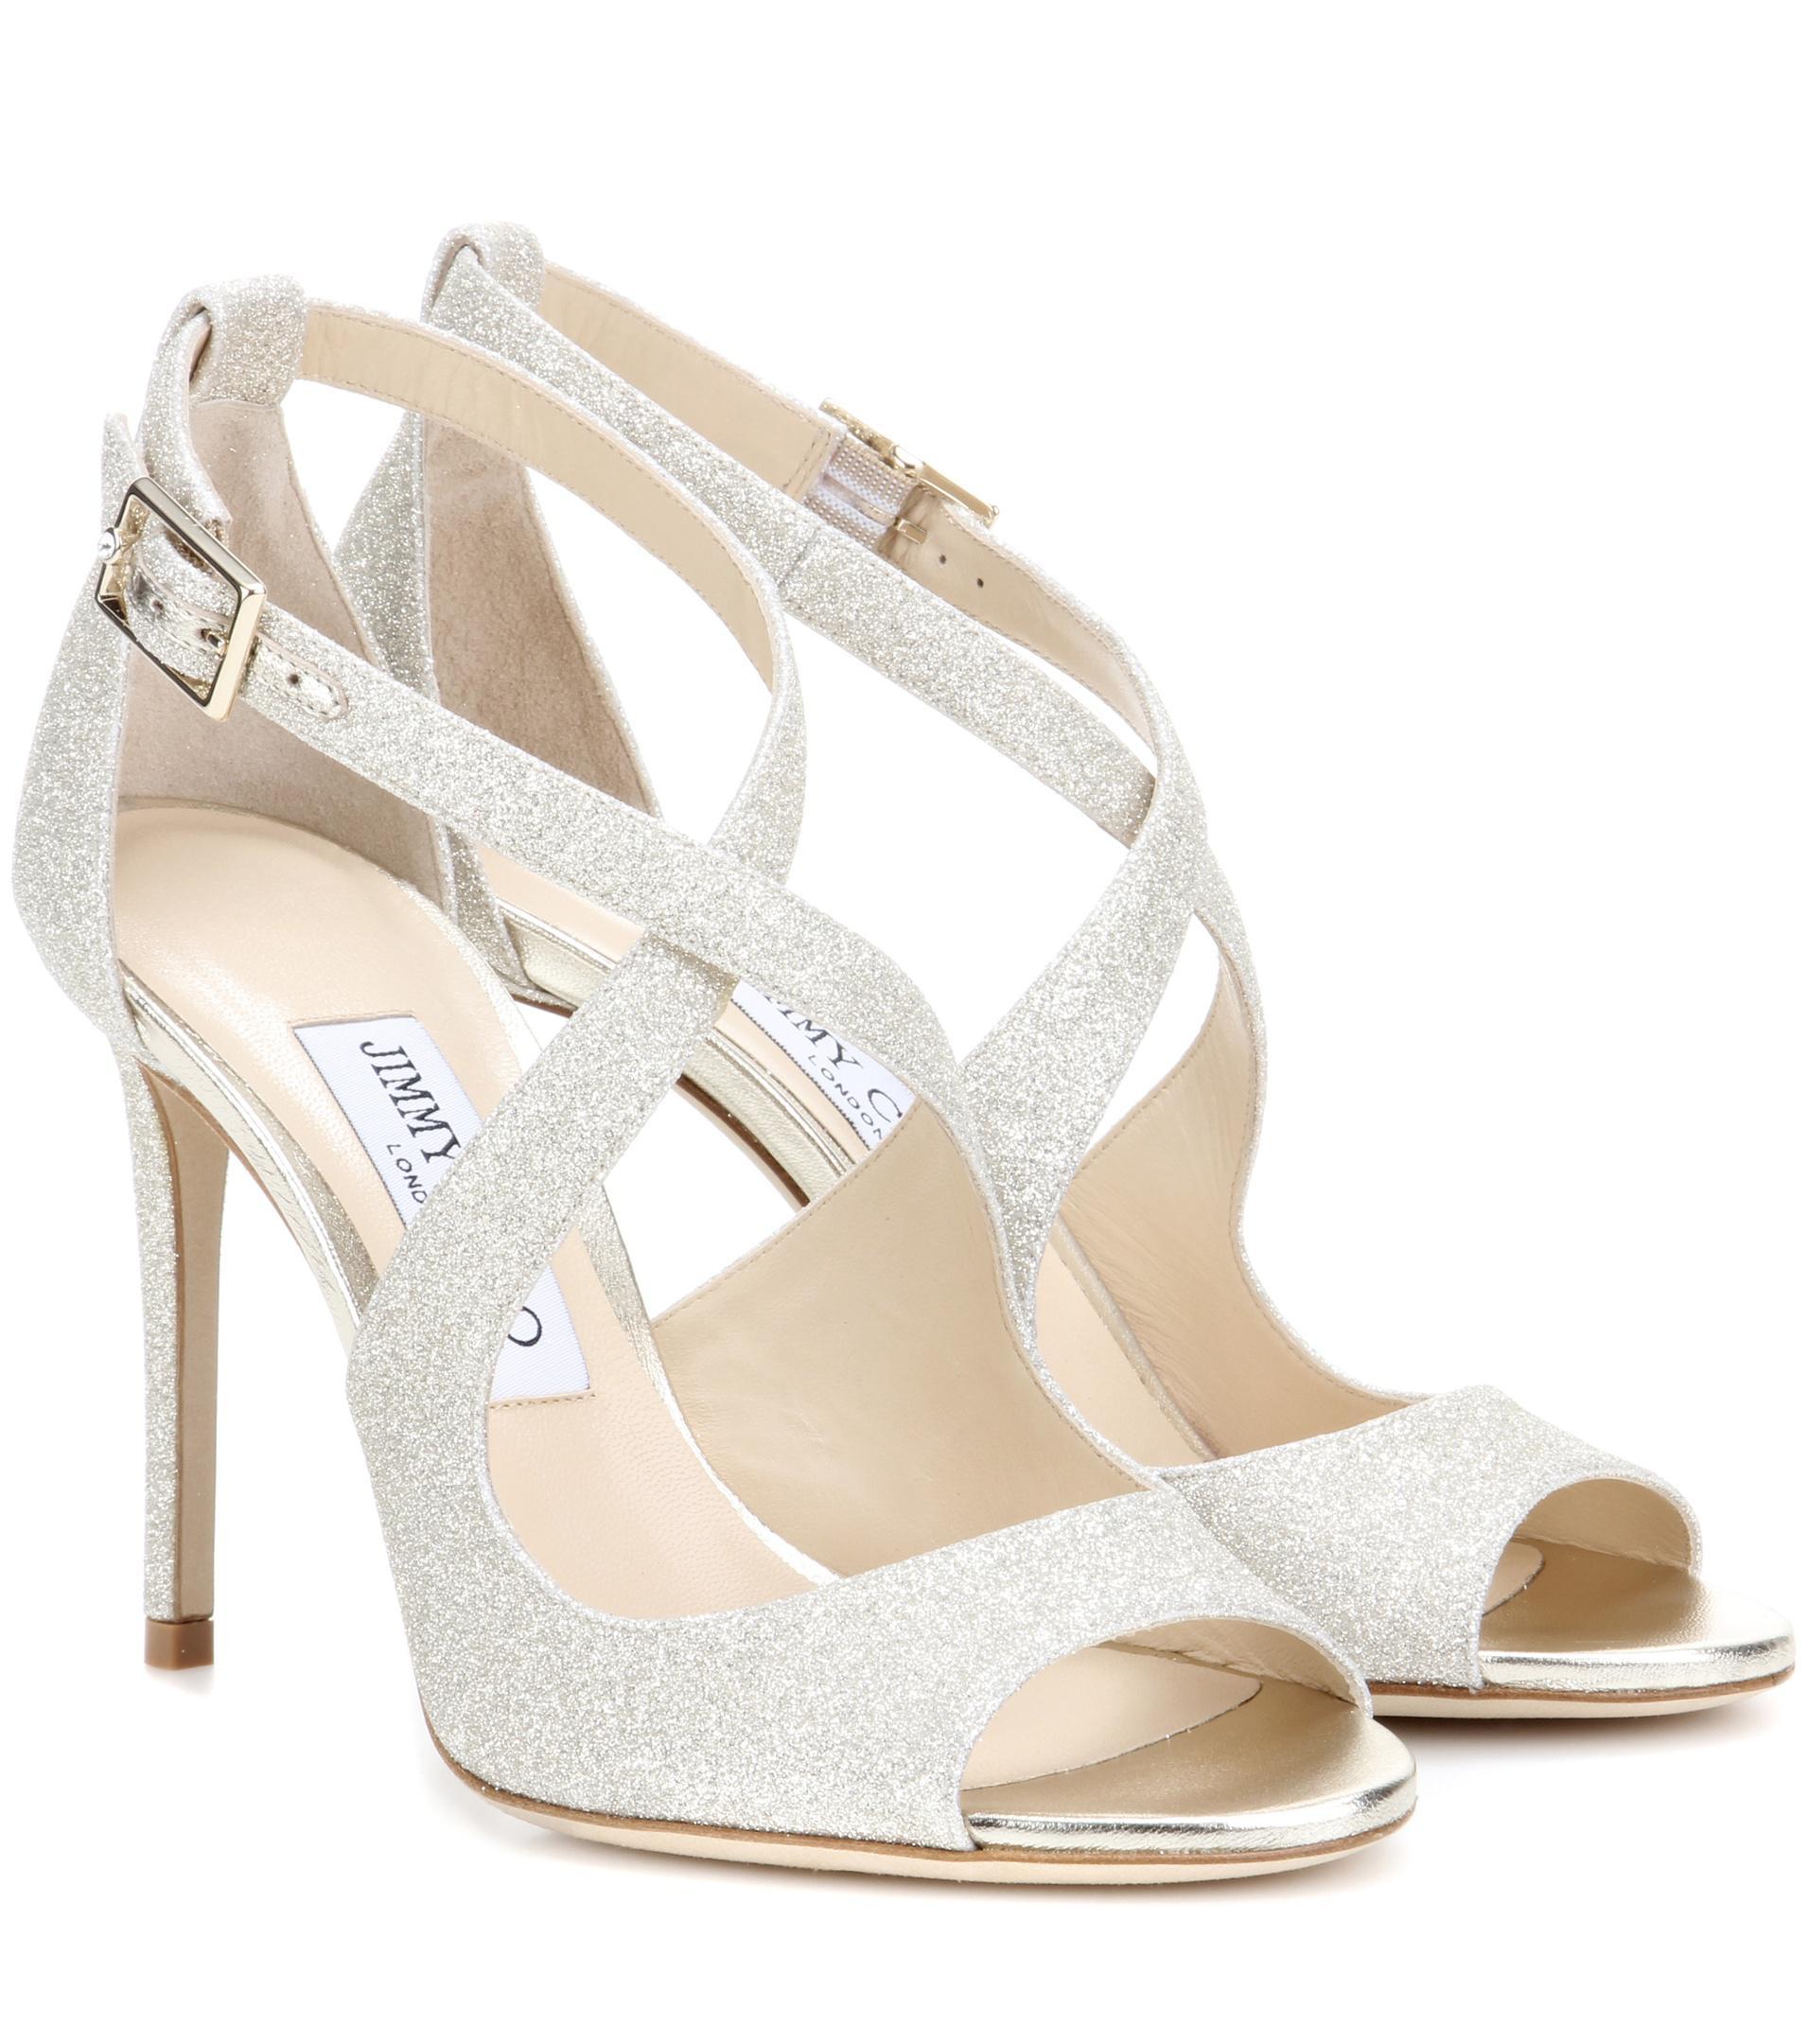 2769a657e2c Lyst - Jimmy Choo Emily 100 Glitter Sandals in Metallic